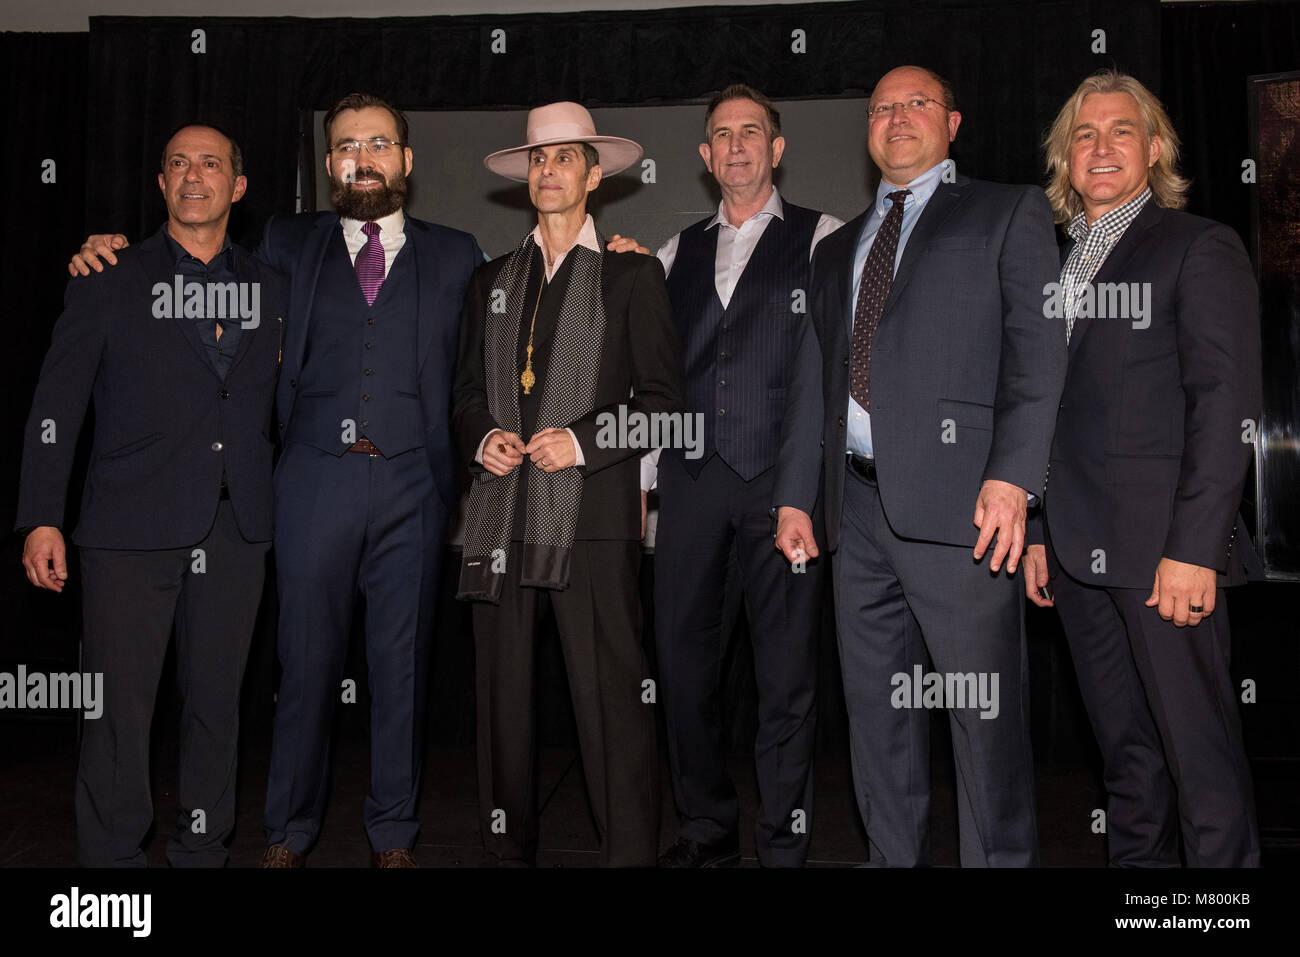 Las Vegas, NV, USA. 13th Mar, 2018. ***HOUSE COVERAGE*** Ken Raasch, Serik Kushenov, Perry Farrel, Ed Jones, Cary - Stock Image